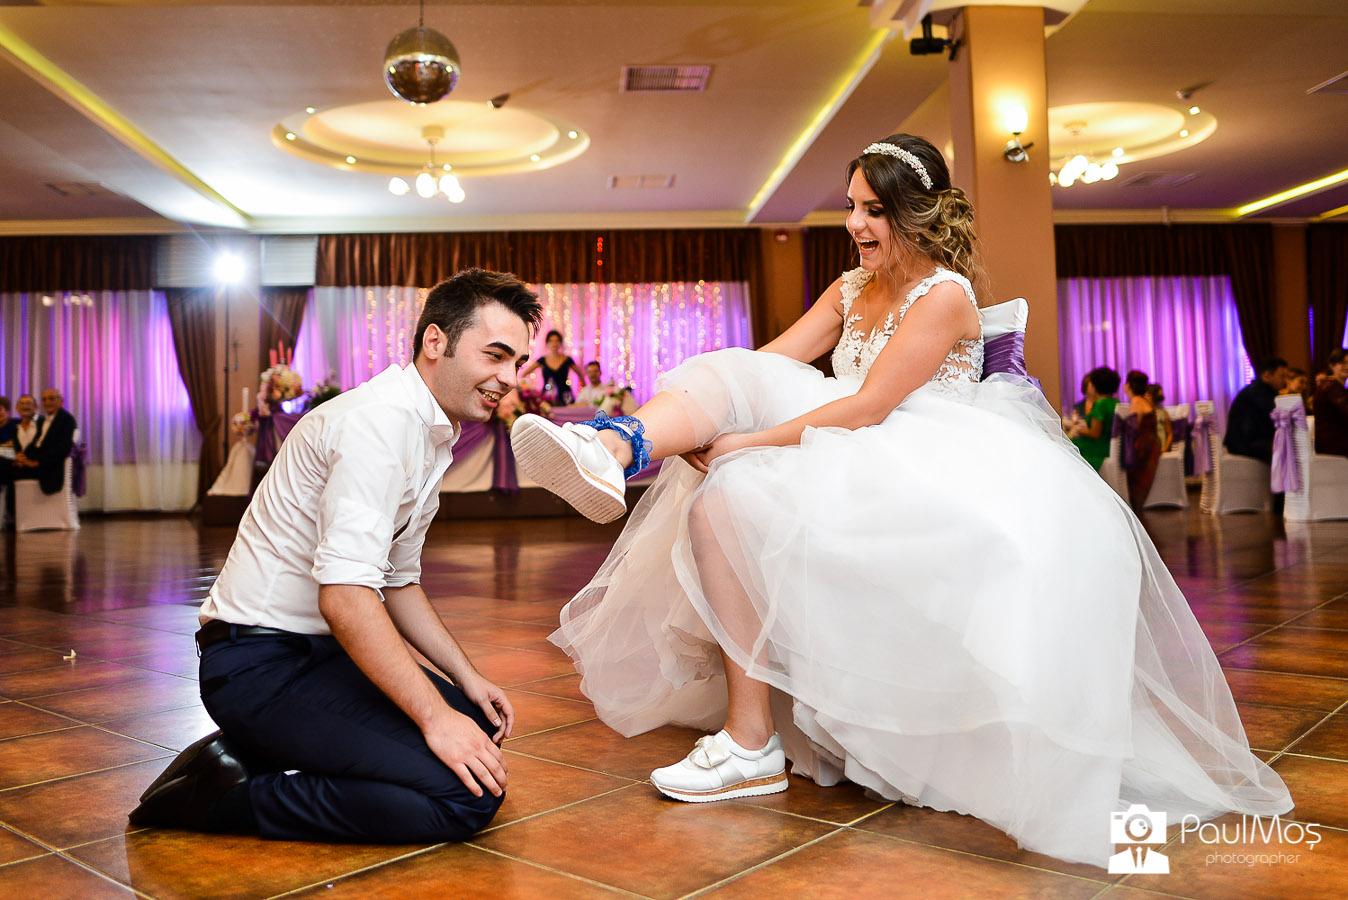 Fotograf Nunta resita, fotograf profesionist, fotograf bun resita, fotografii de nunta, foto-video nunta, servicii fotografice